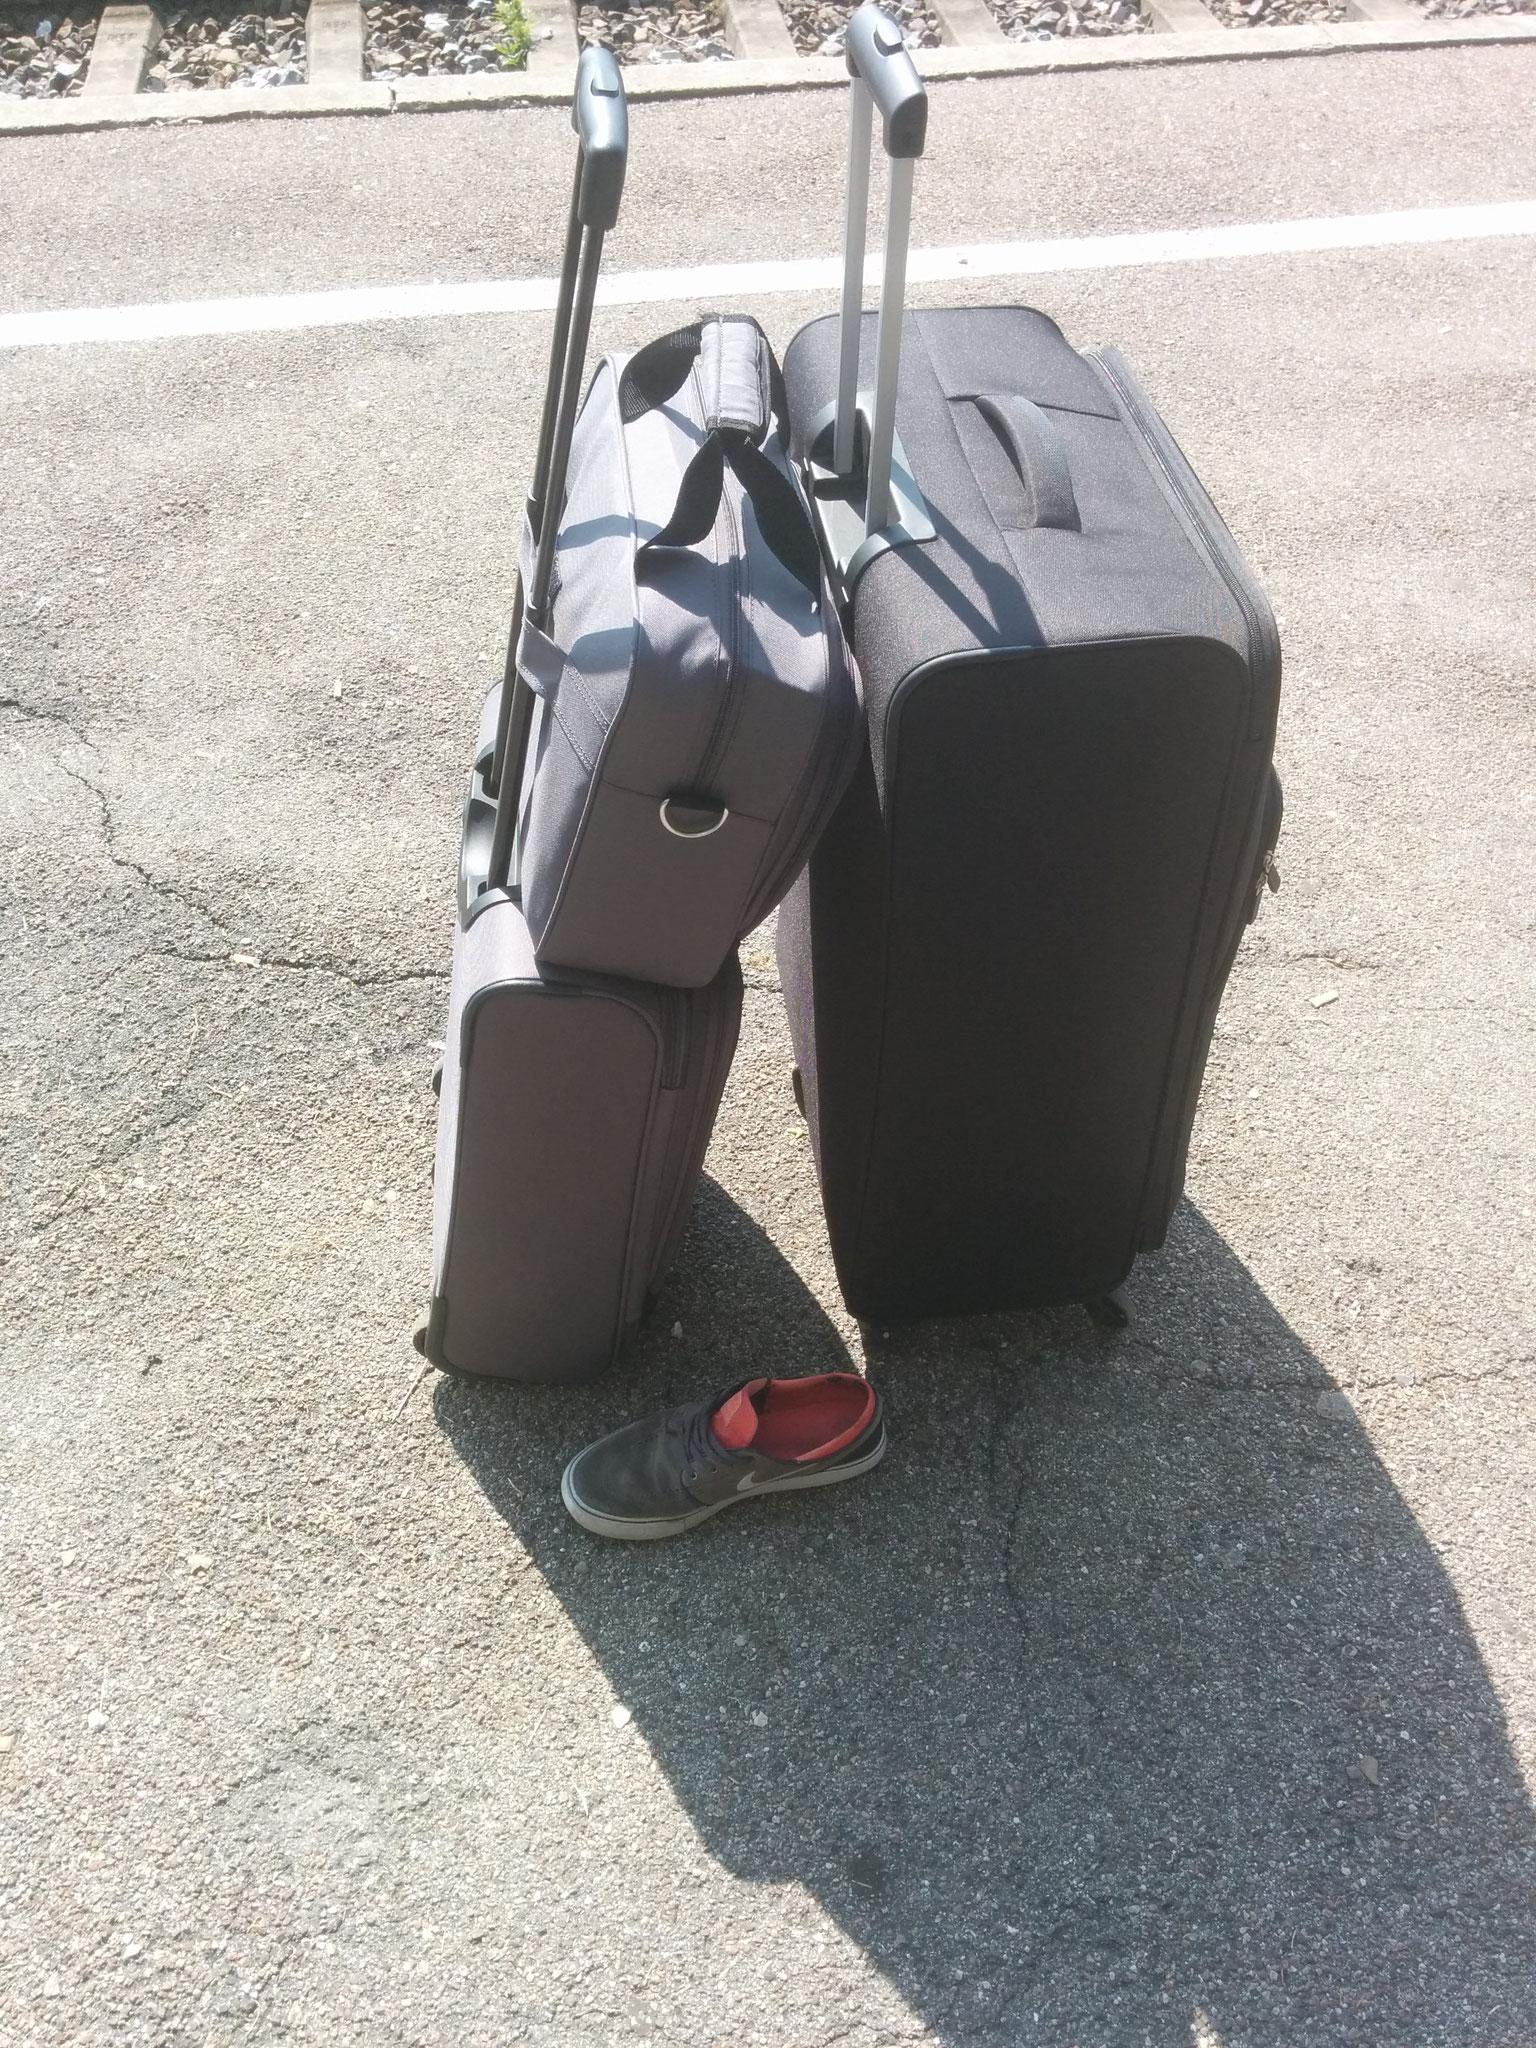 1 Germany - Departure